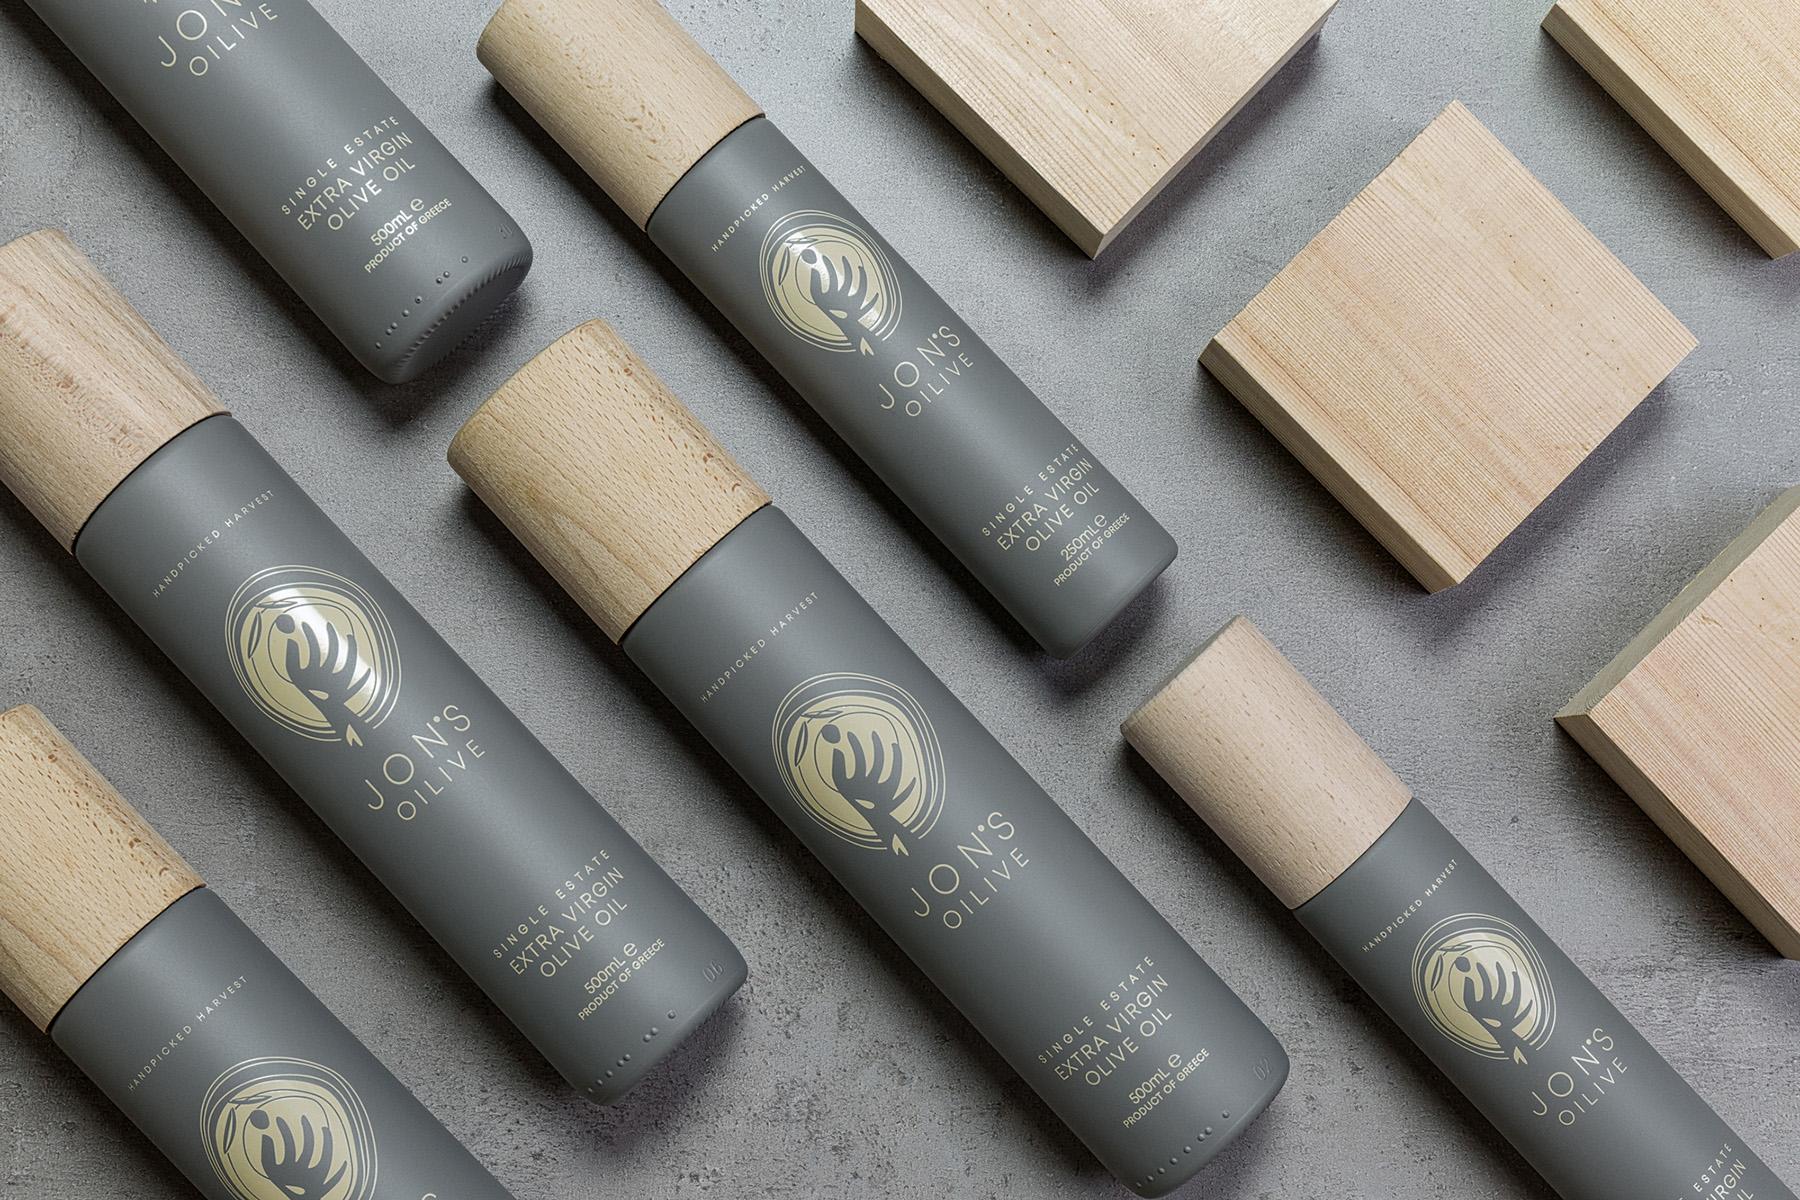 Jon's Oilive Olive Oil Packaging Design